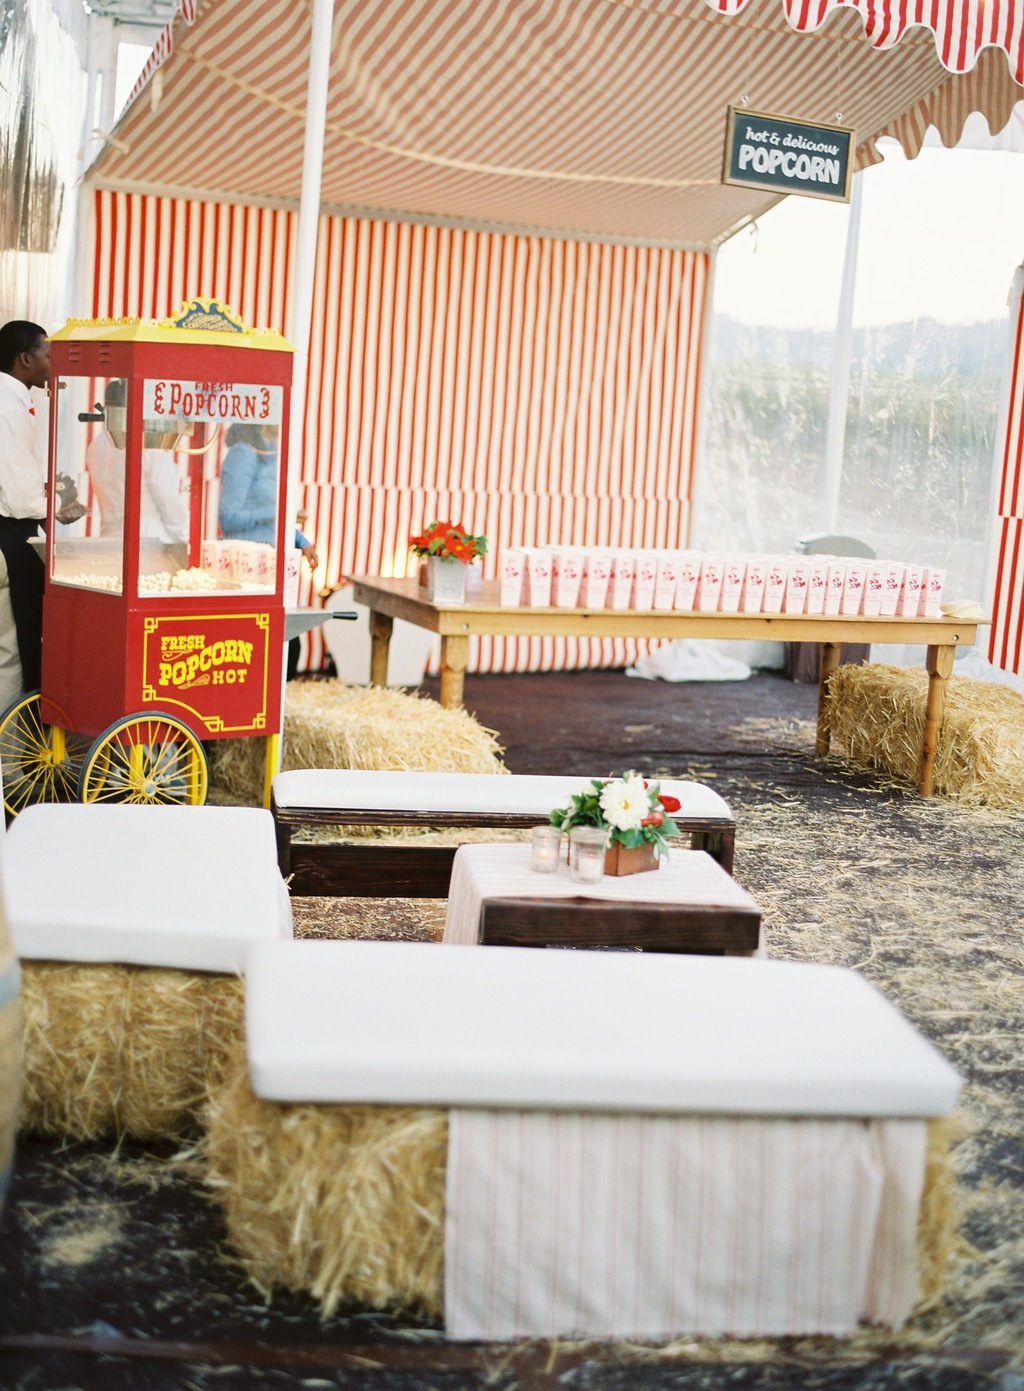 Wedding-santa-barbara-chic-outdoor-barn-circus-fair-food-jose-villa-unique-wedding-appetizers-setup-11.full